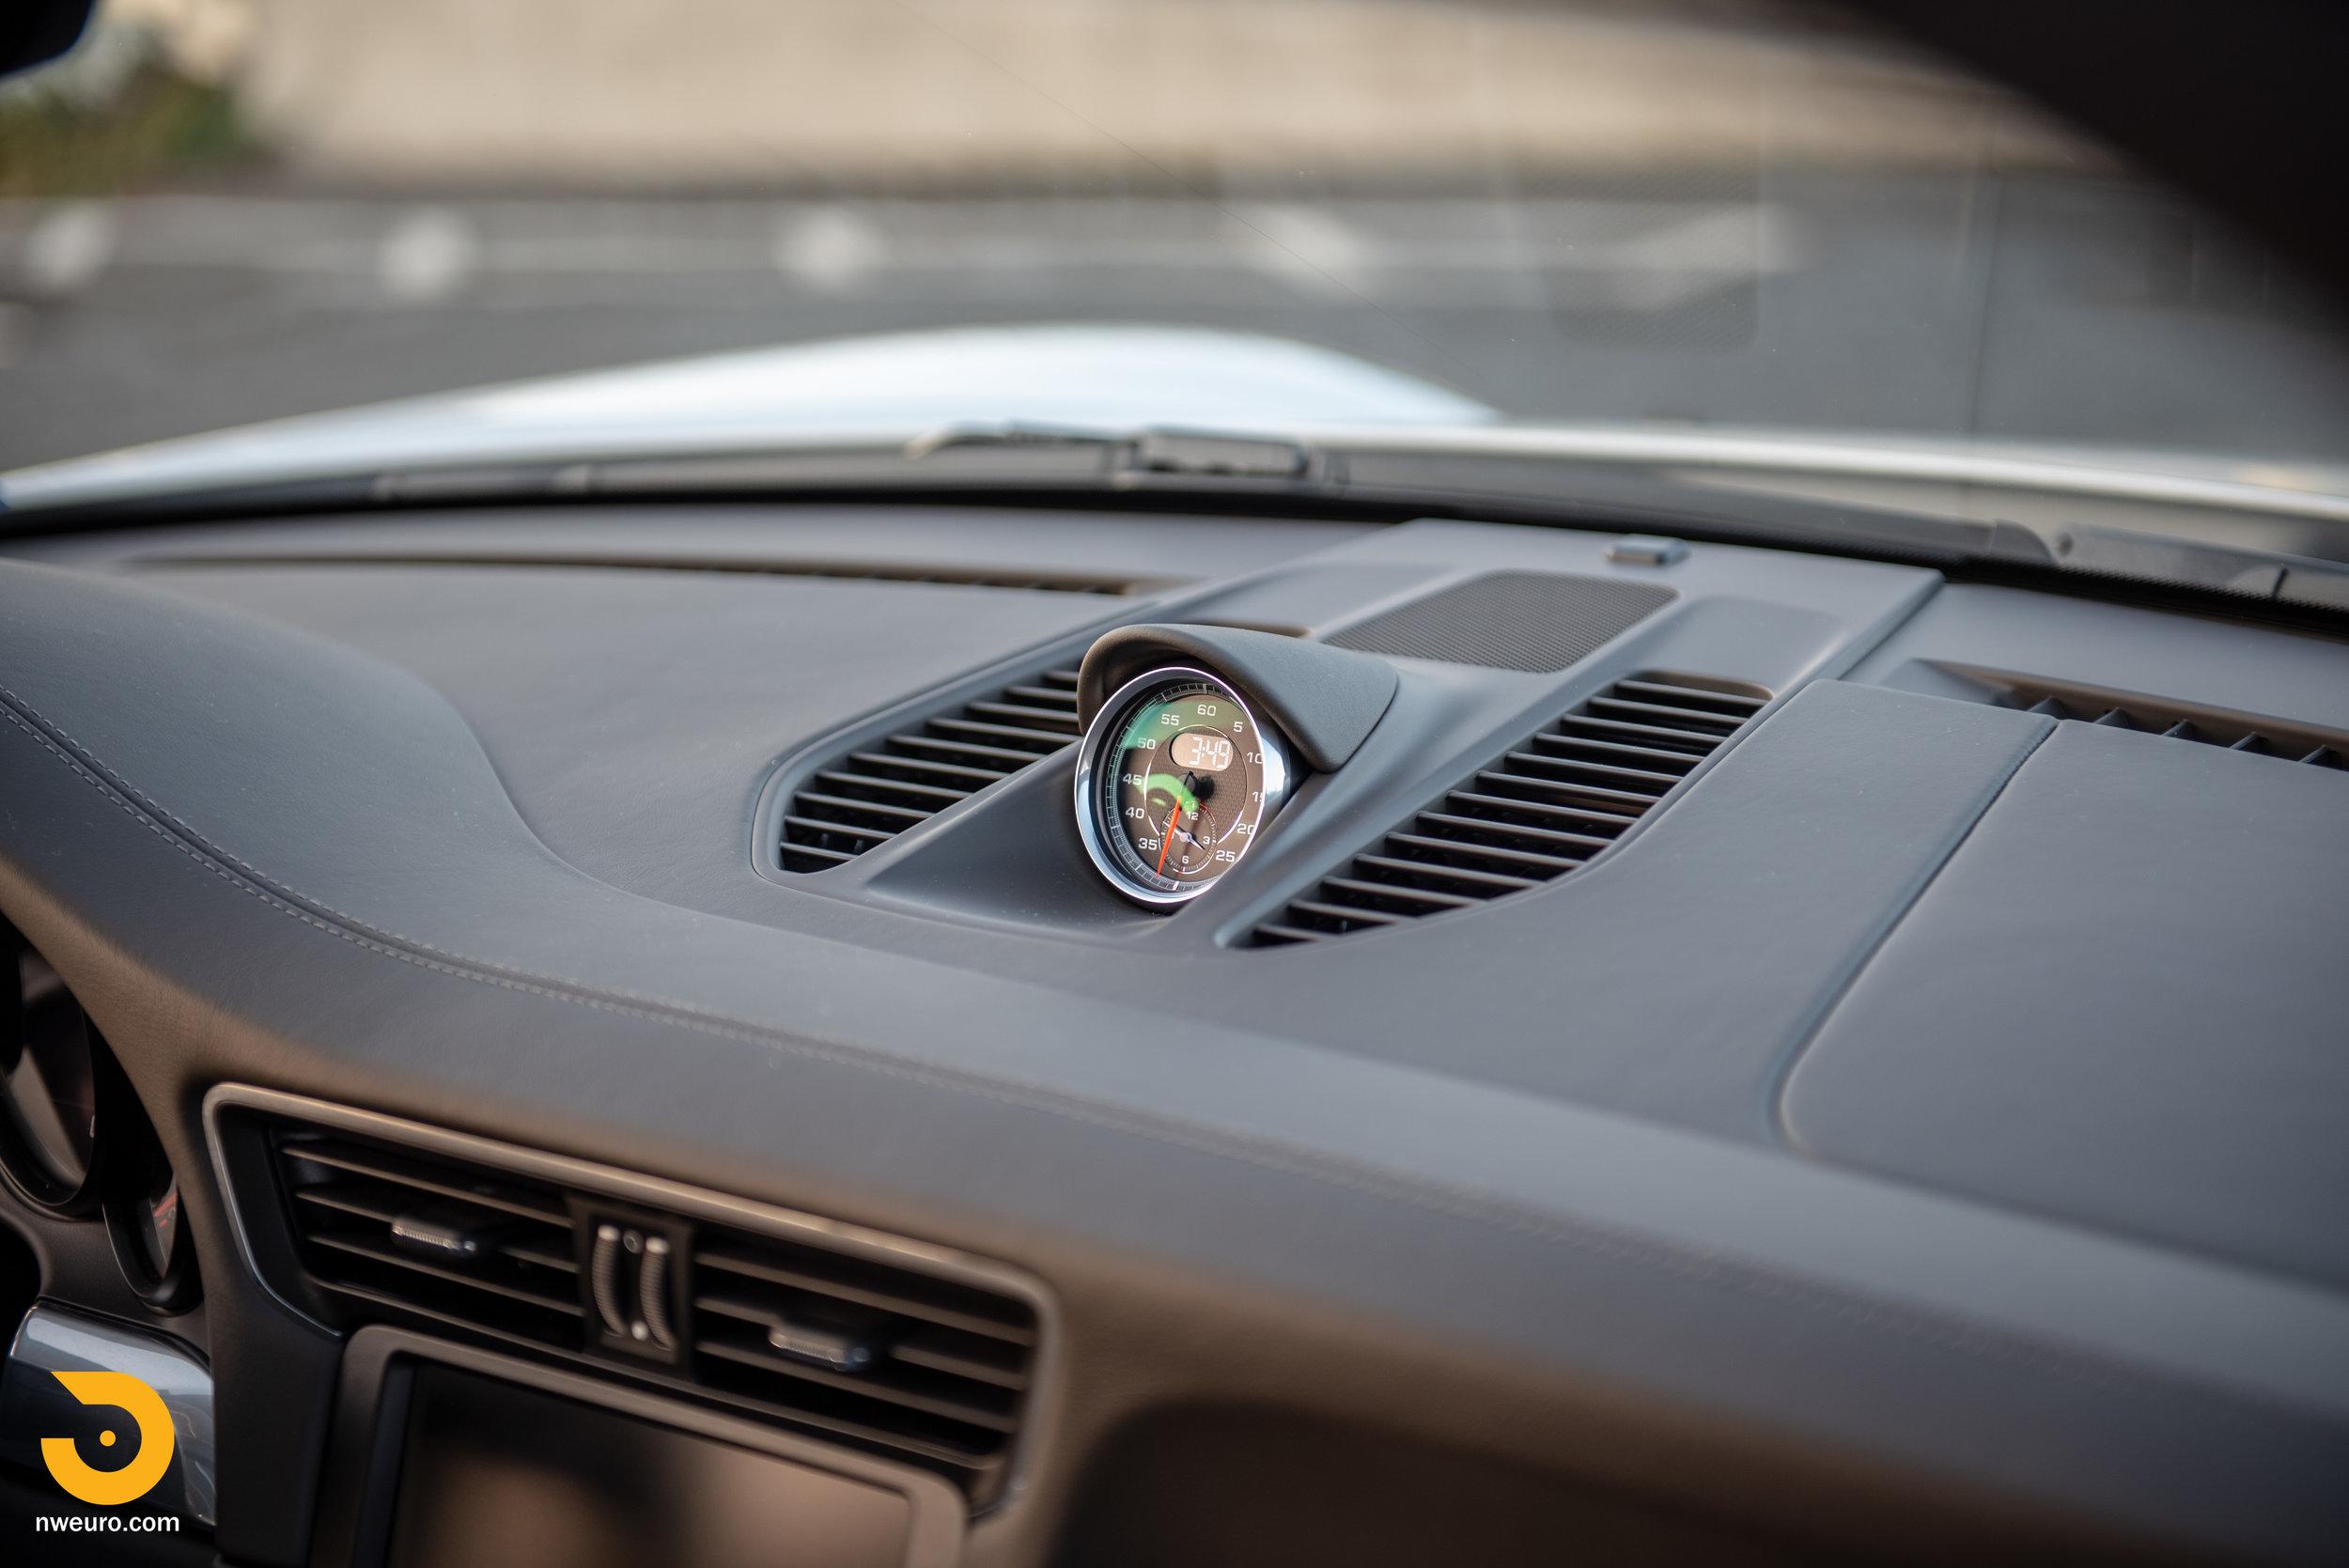 2012 Porsche Carrera S-4.jpg